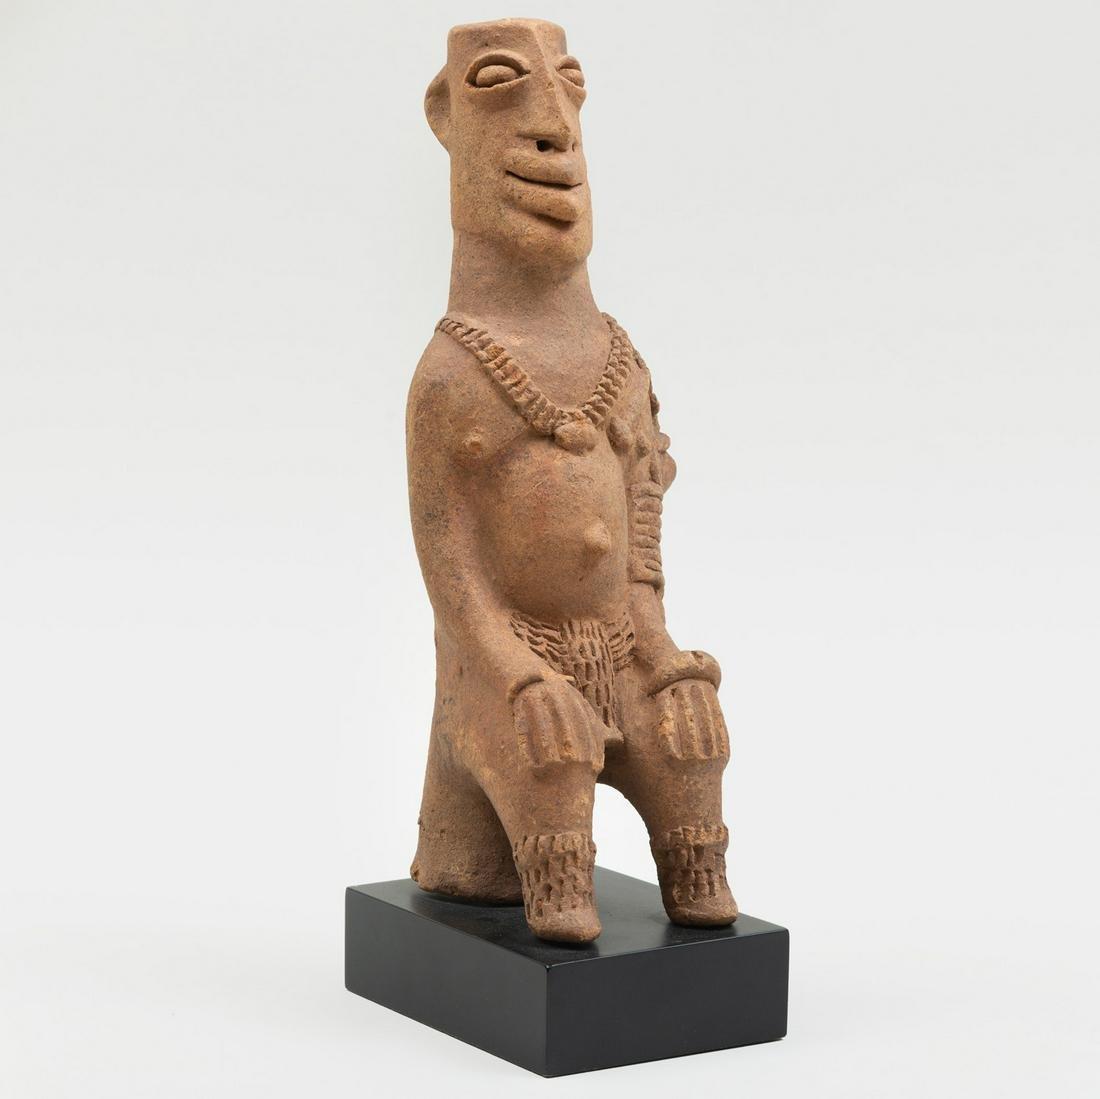 Koma Builsa Seated Terracotta Figure, Ghana